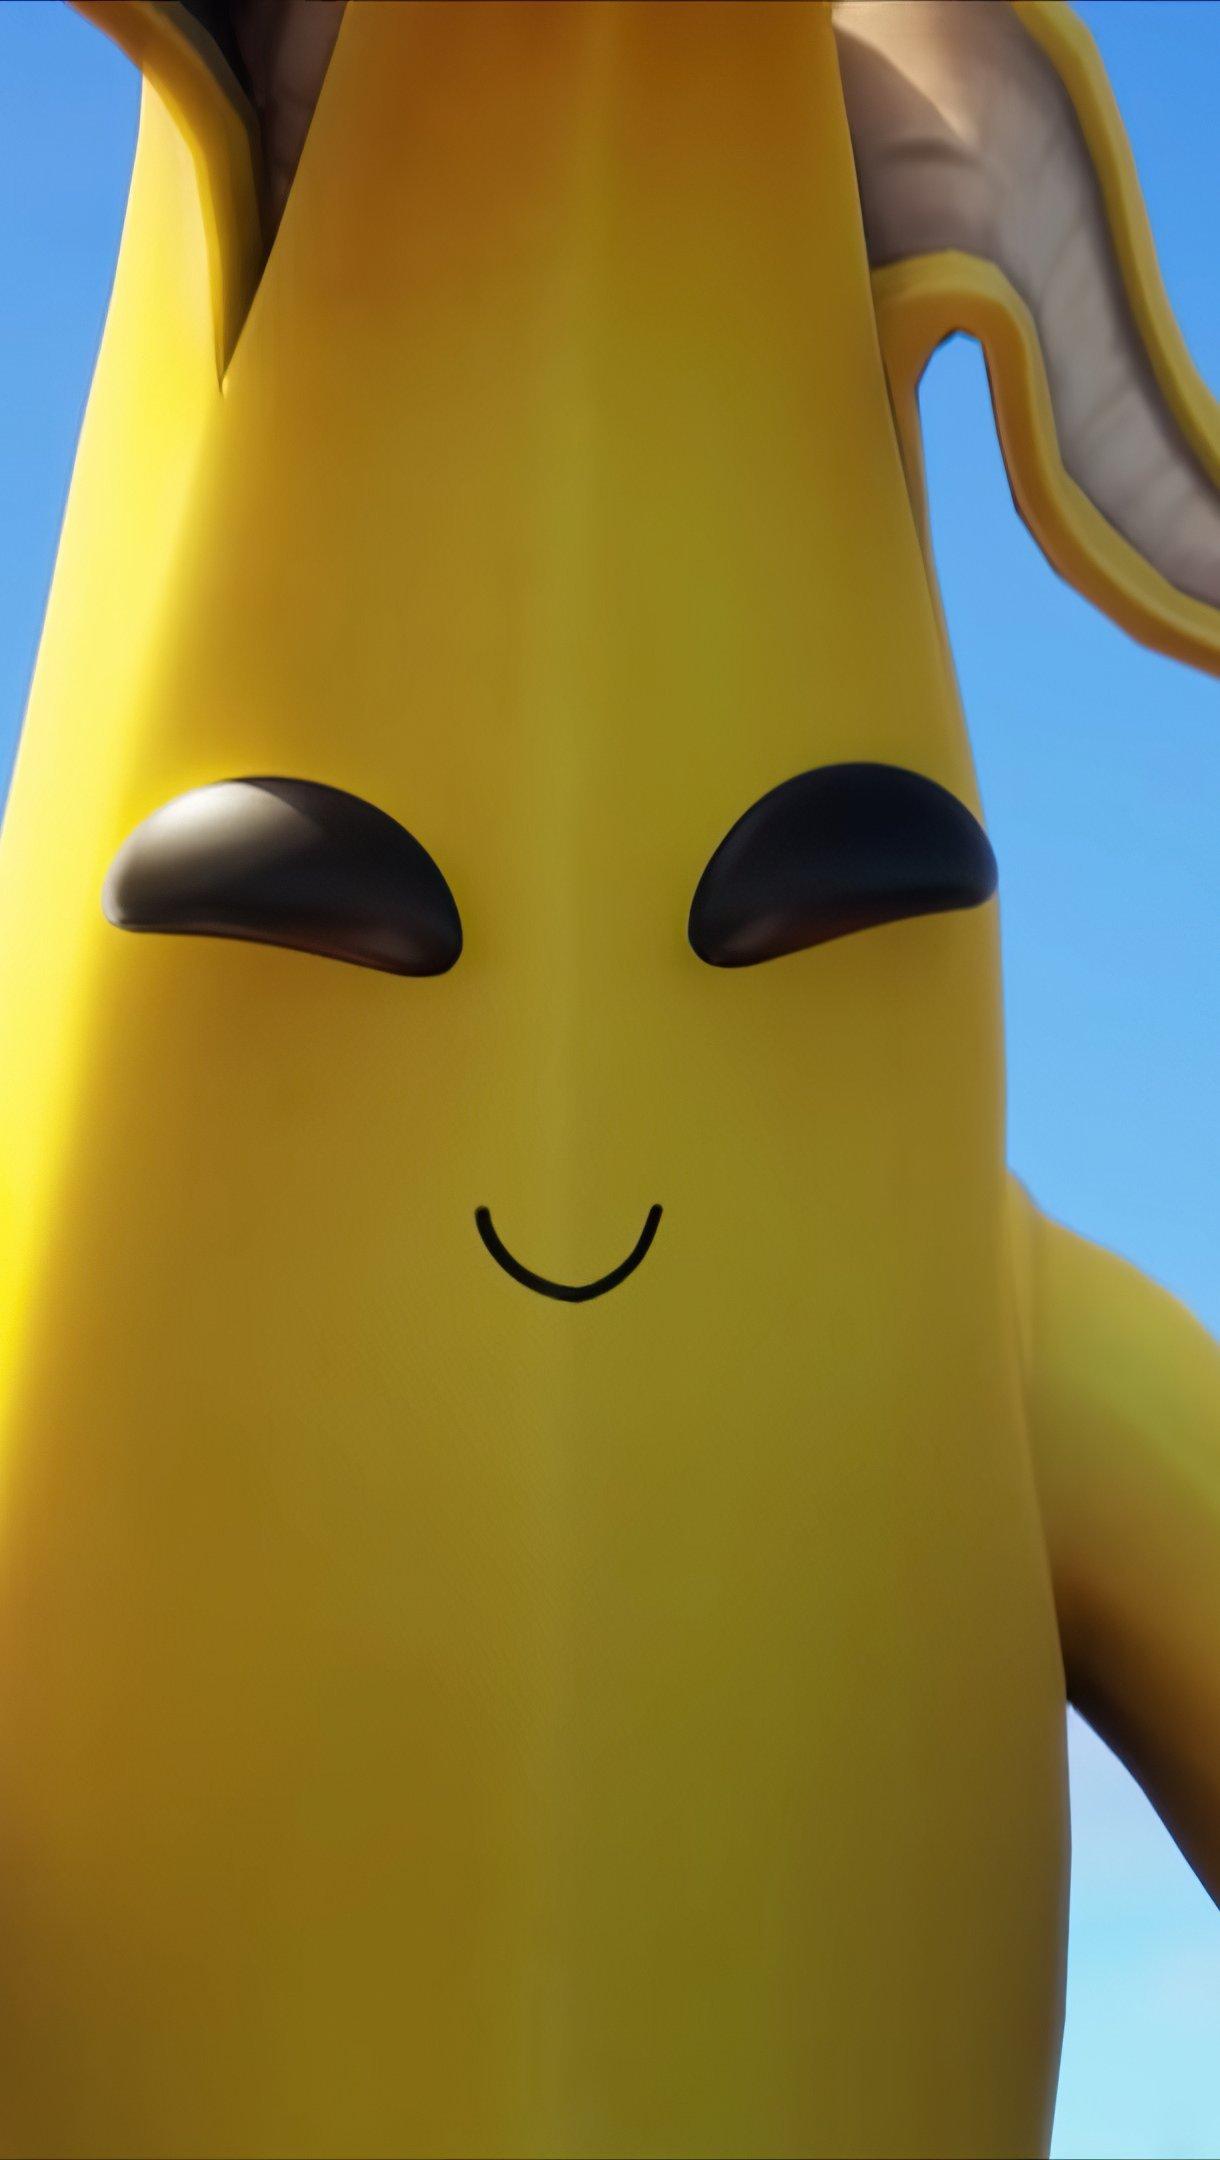 Fondos de pantalla Peely Banana Claw de Fortnite Vertical